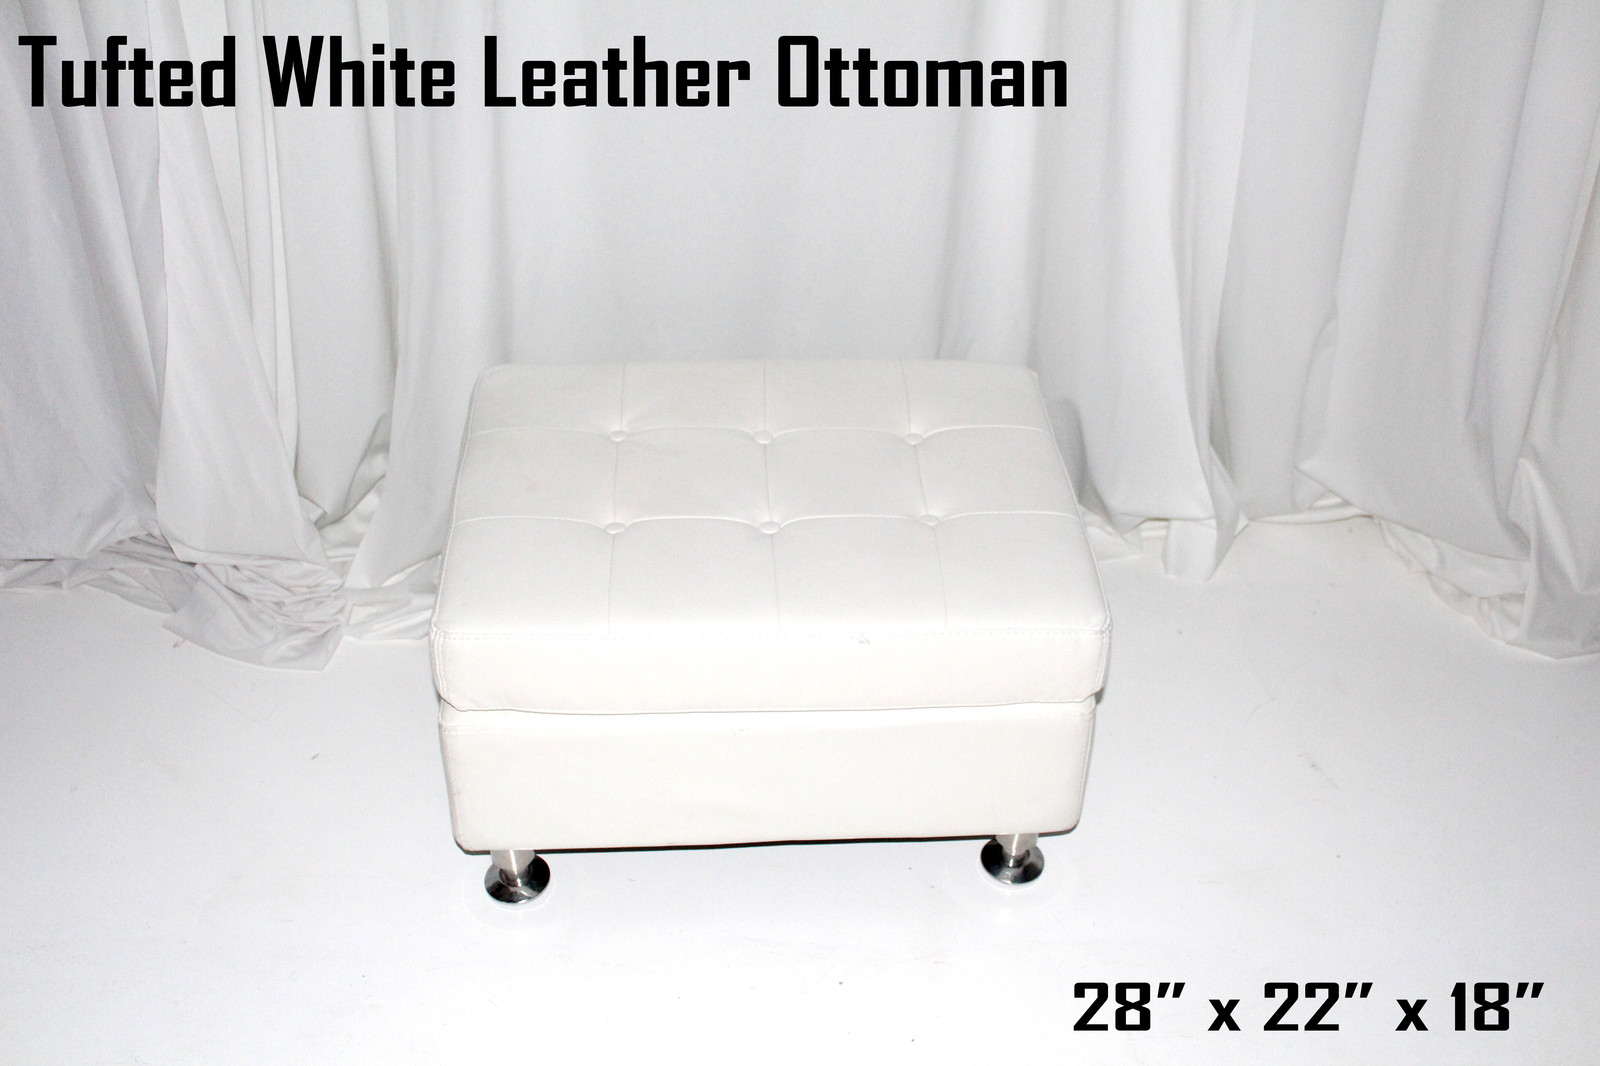 Tufted White Leather Ottoman